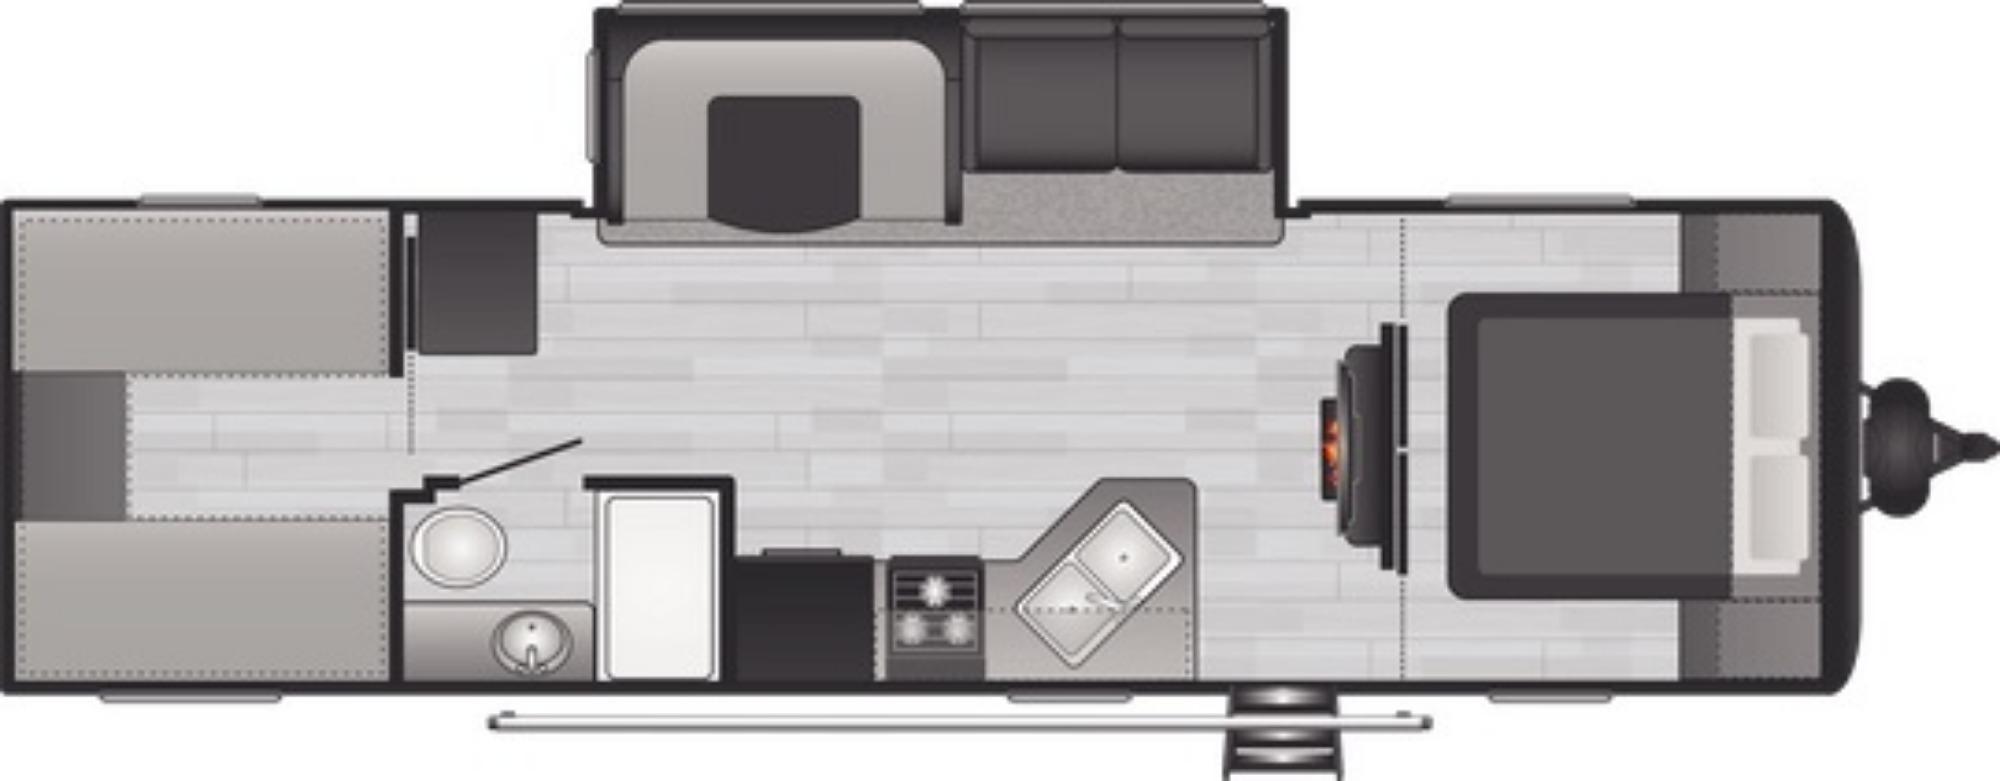 View Floor Plan for 2021 KEYSTONE HIDEOUT 29BQWE